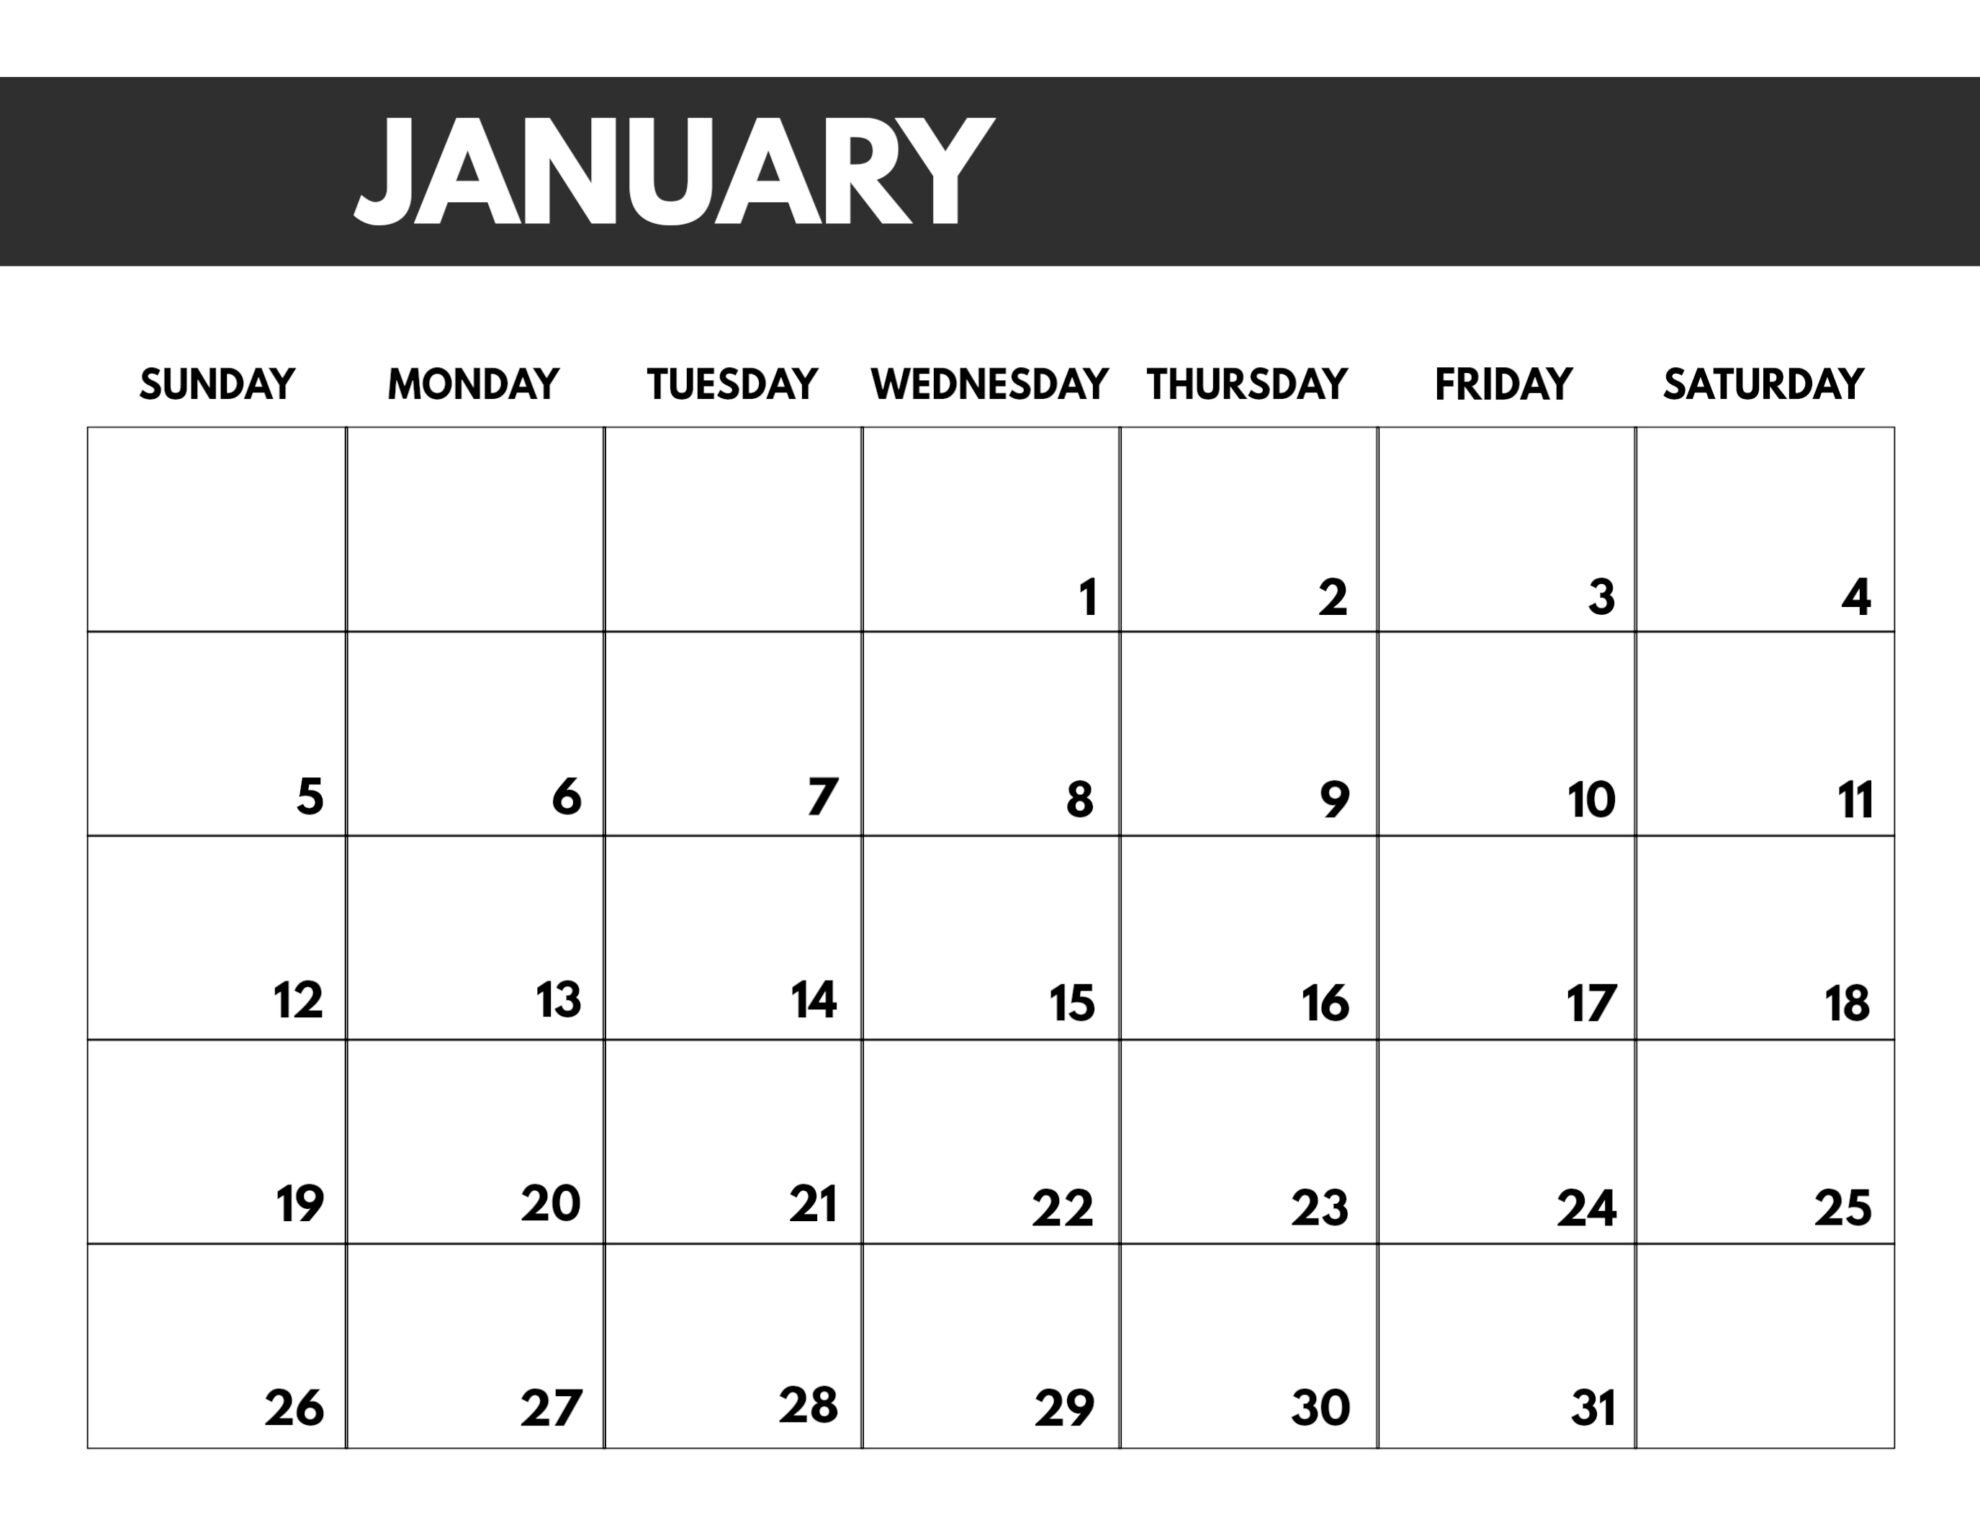 Free 8.5 X 11 Calendars - Calendar Inspiration Design 8.5 By 11 Calendar